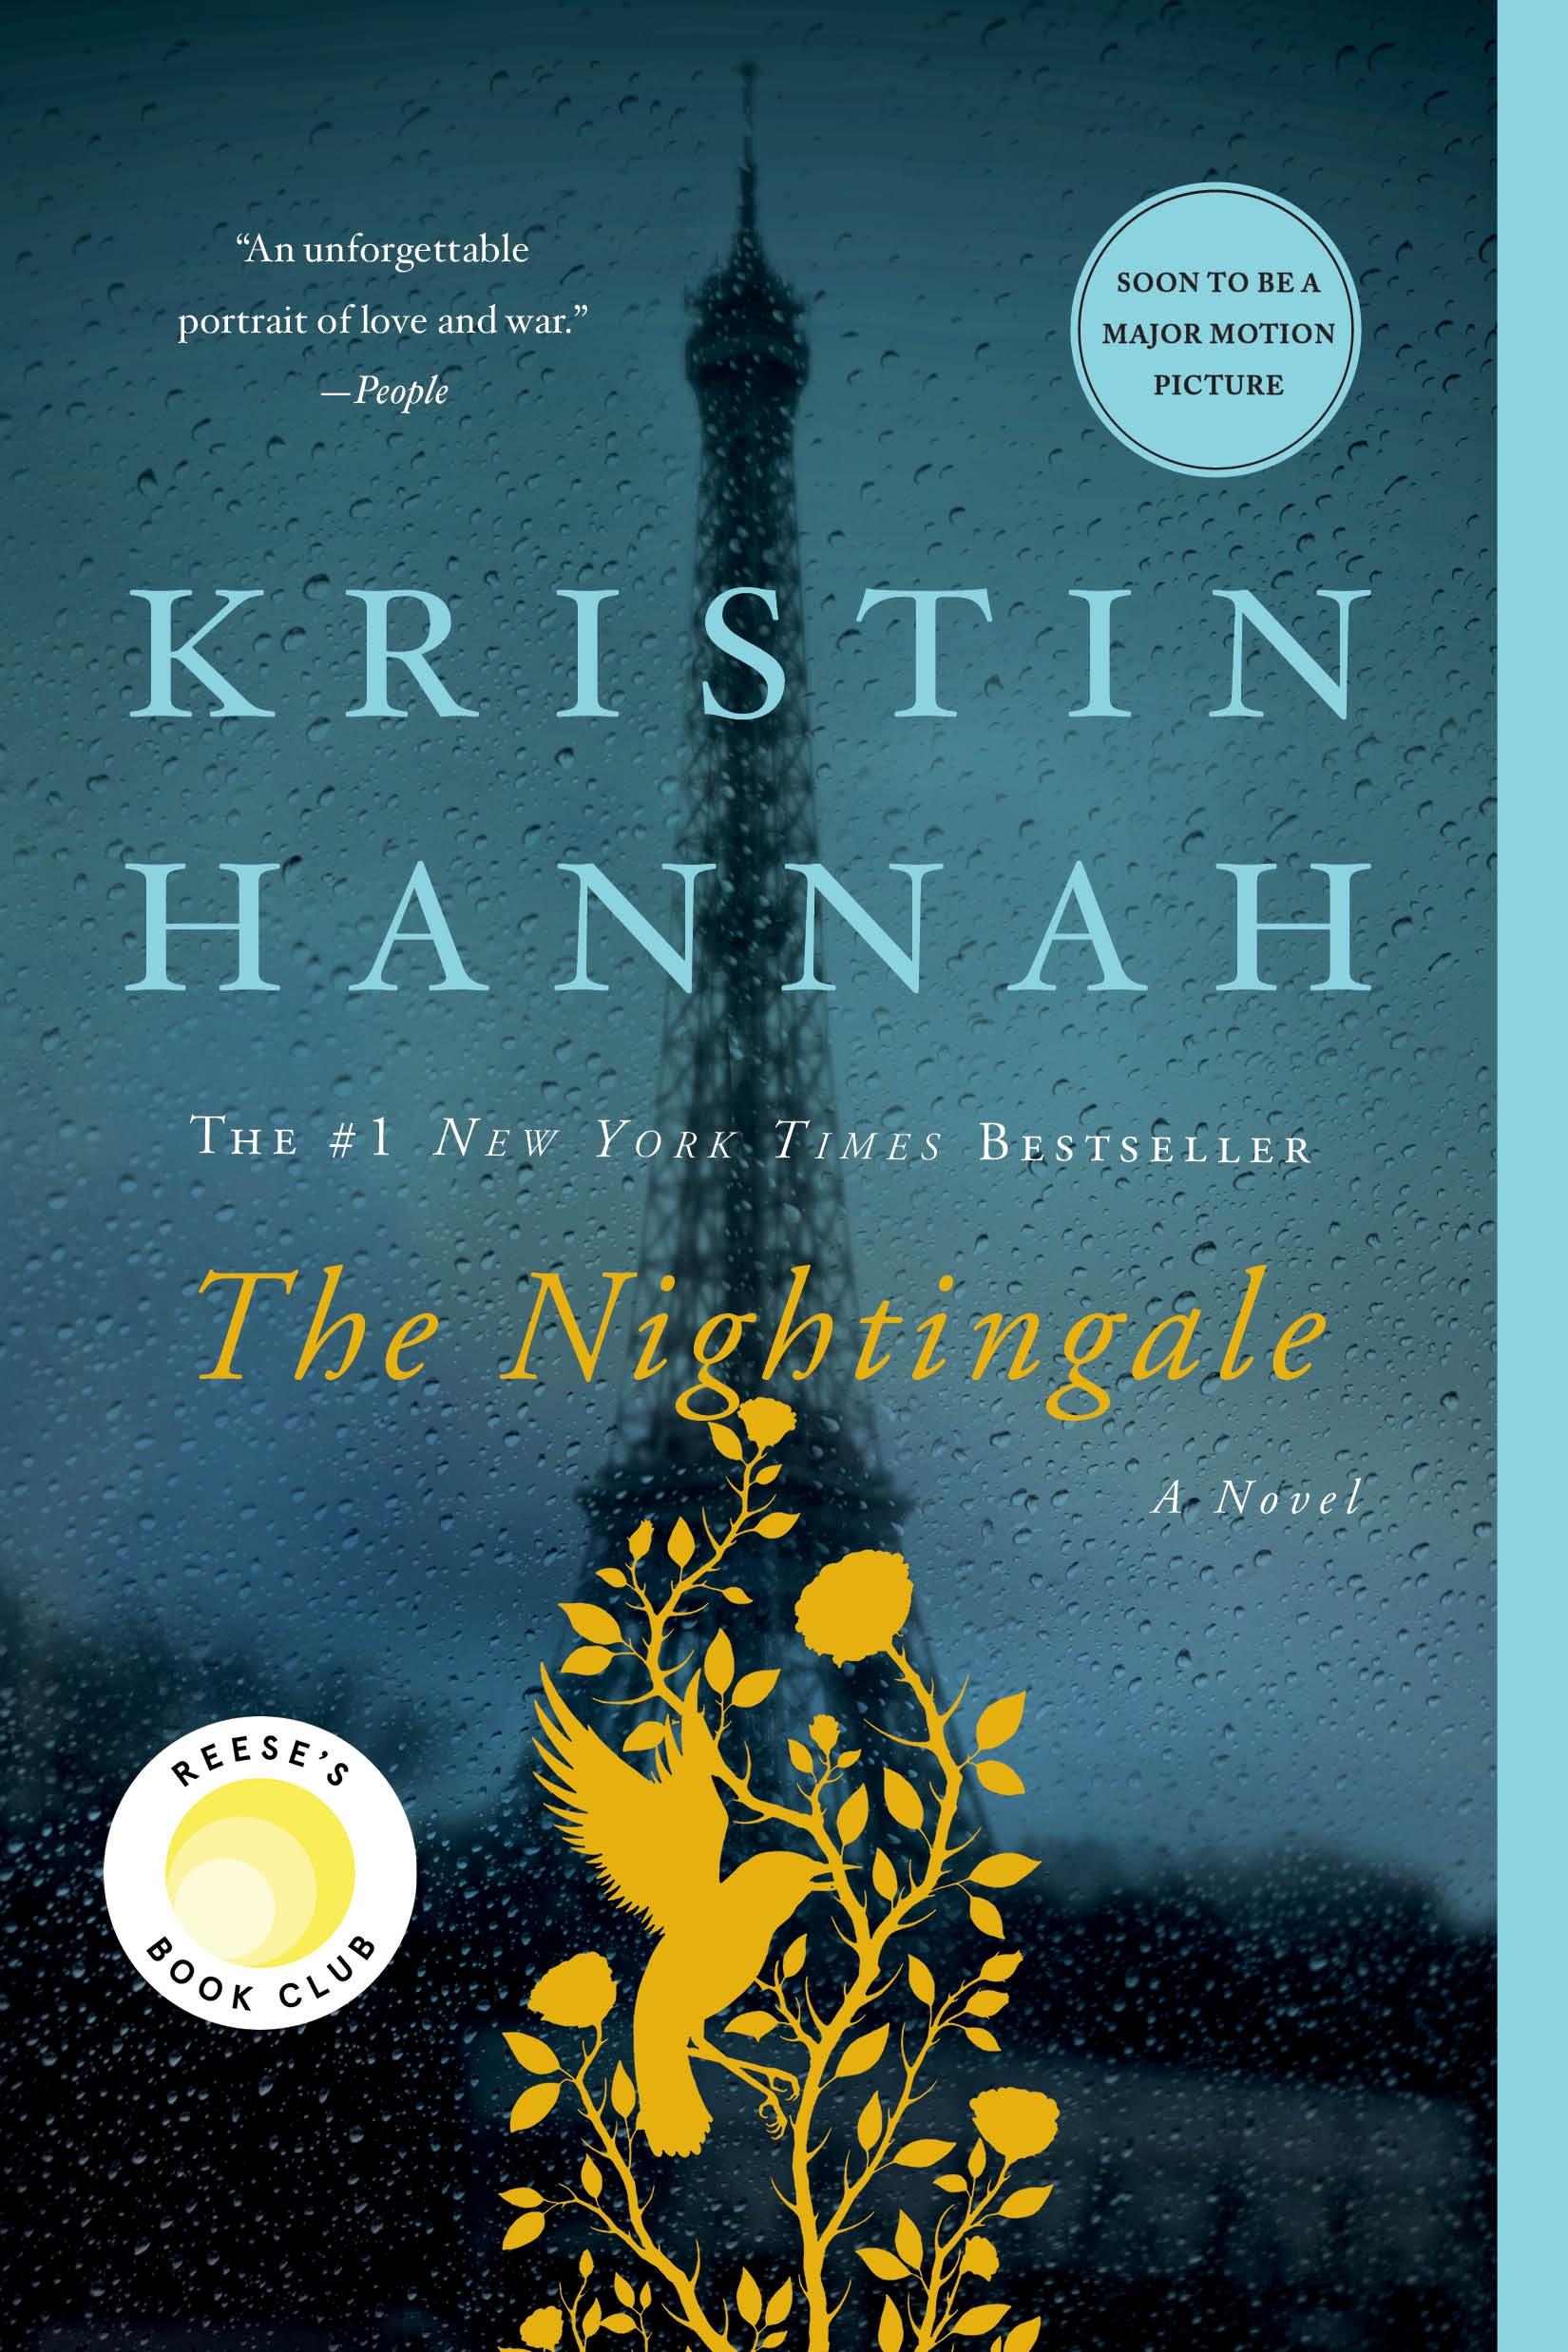 The nightingale [eBook]